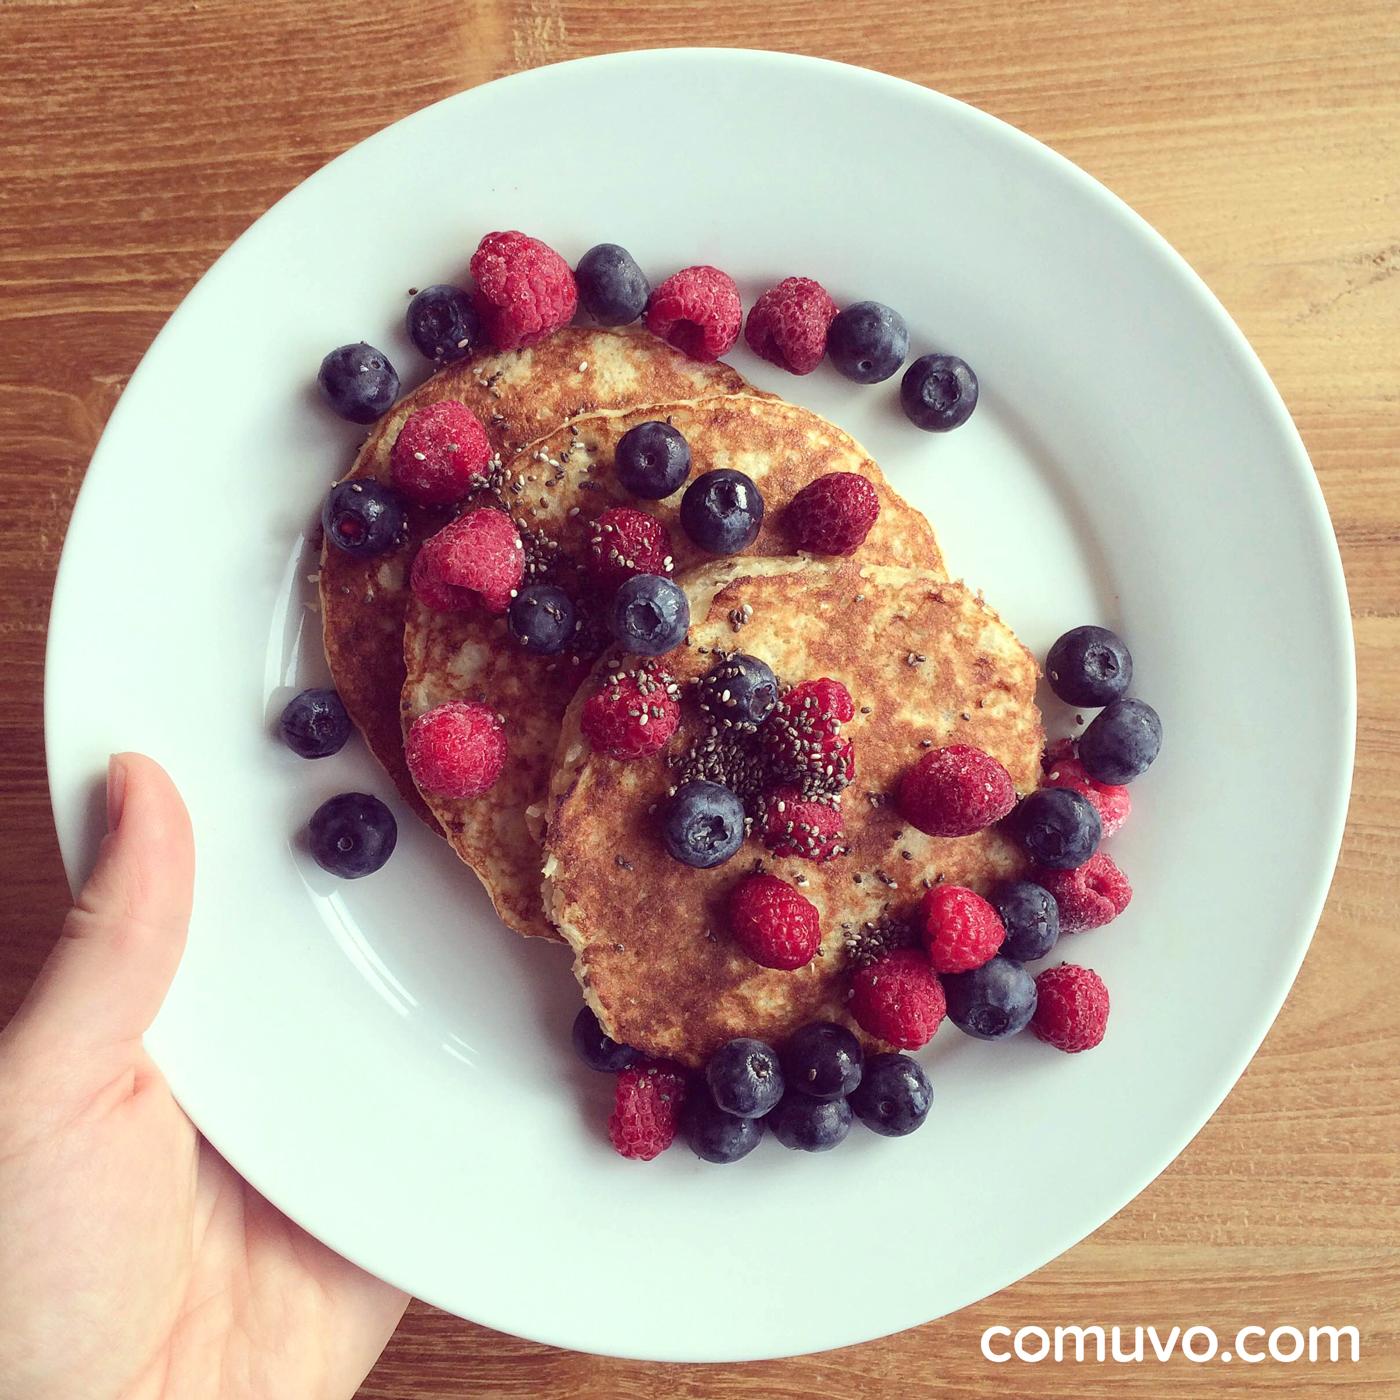 Rezept gluten- und zuckerfreie Banana-Pancakes & Overnight Oat Schoko Banane | comuvo